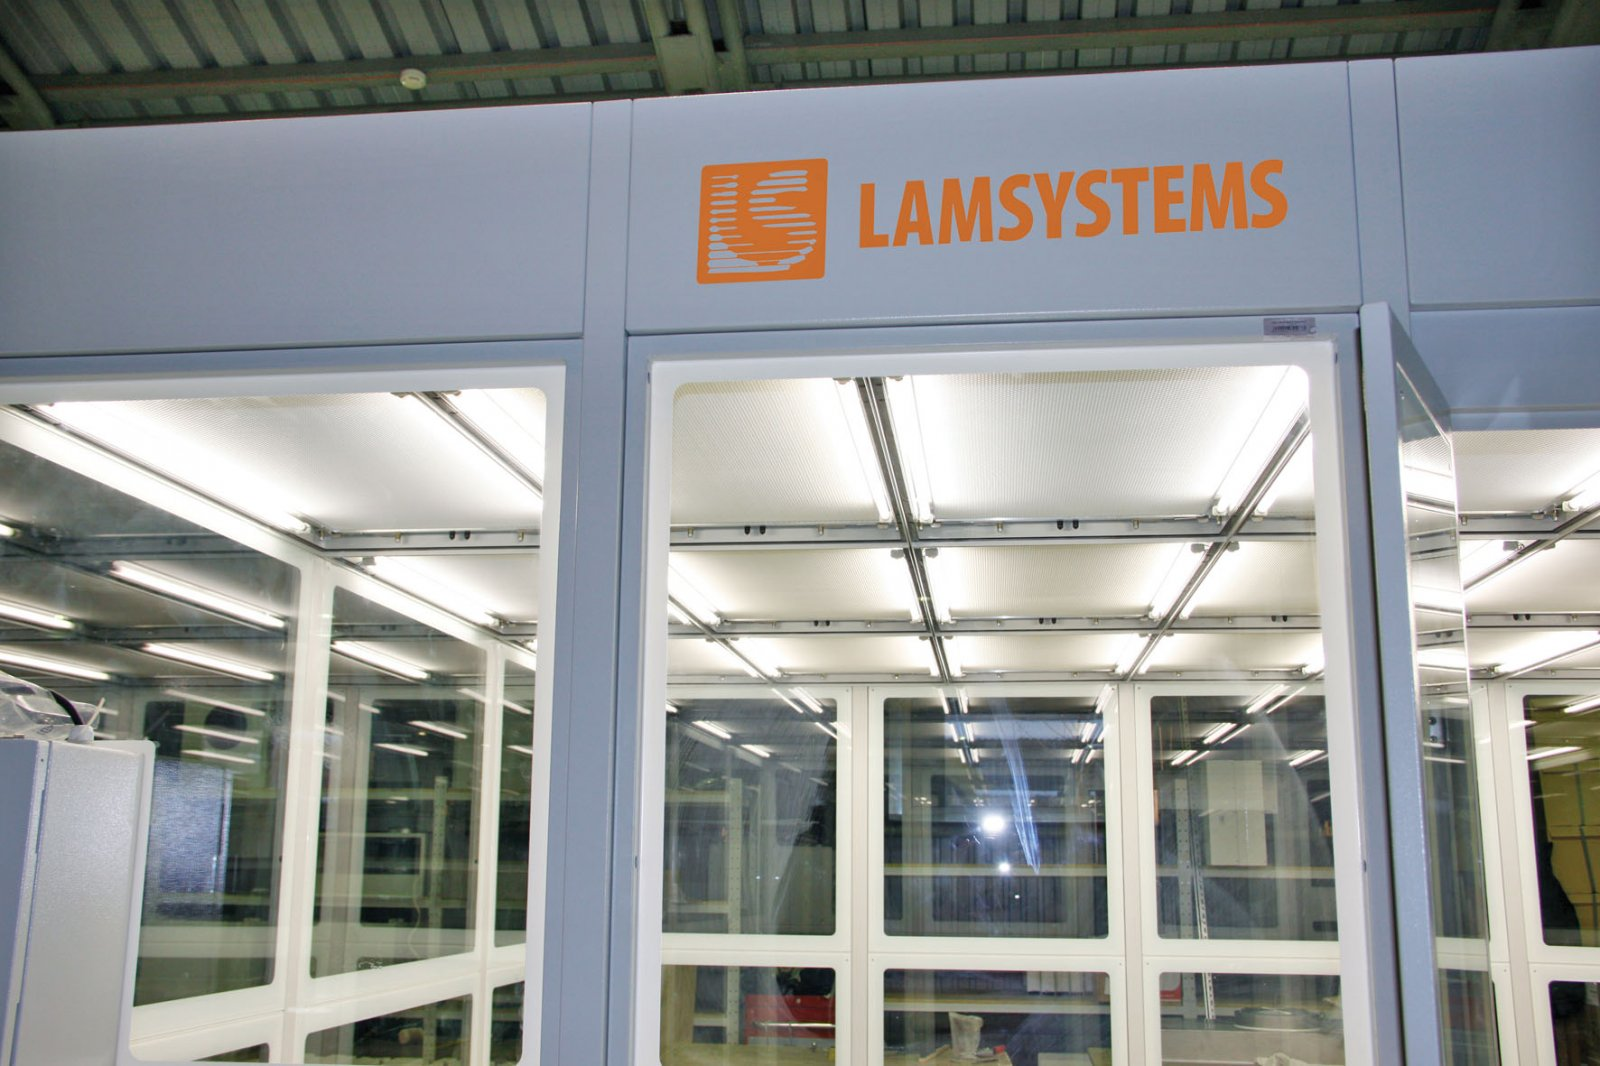 Чистые зоны LAMSYSTEMS стали тише